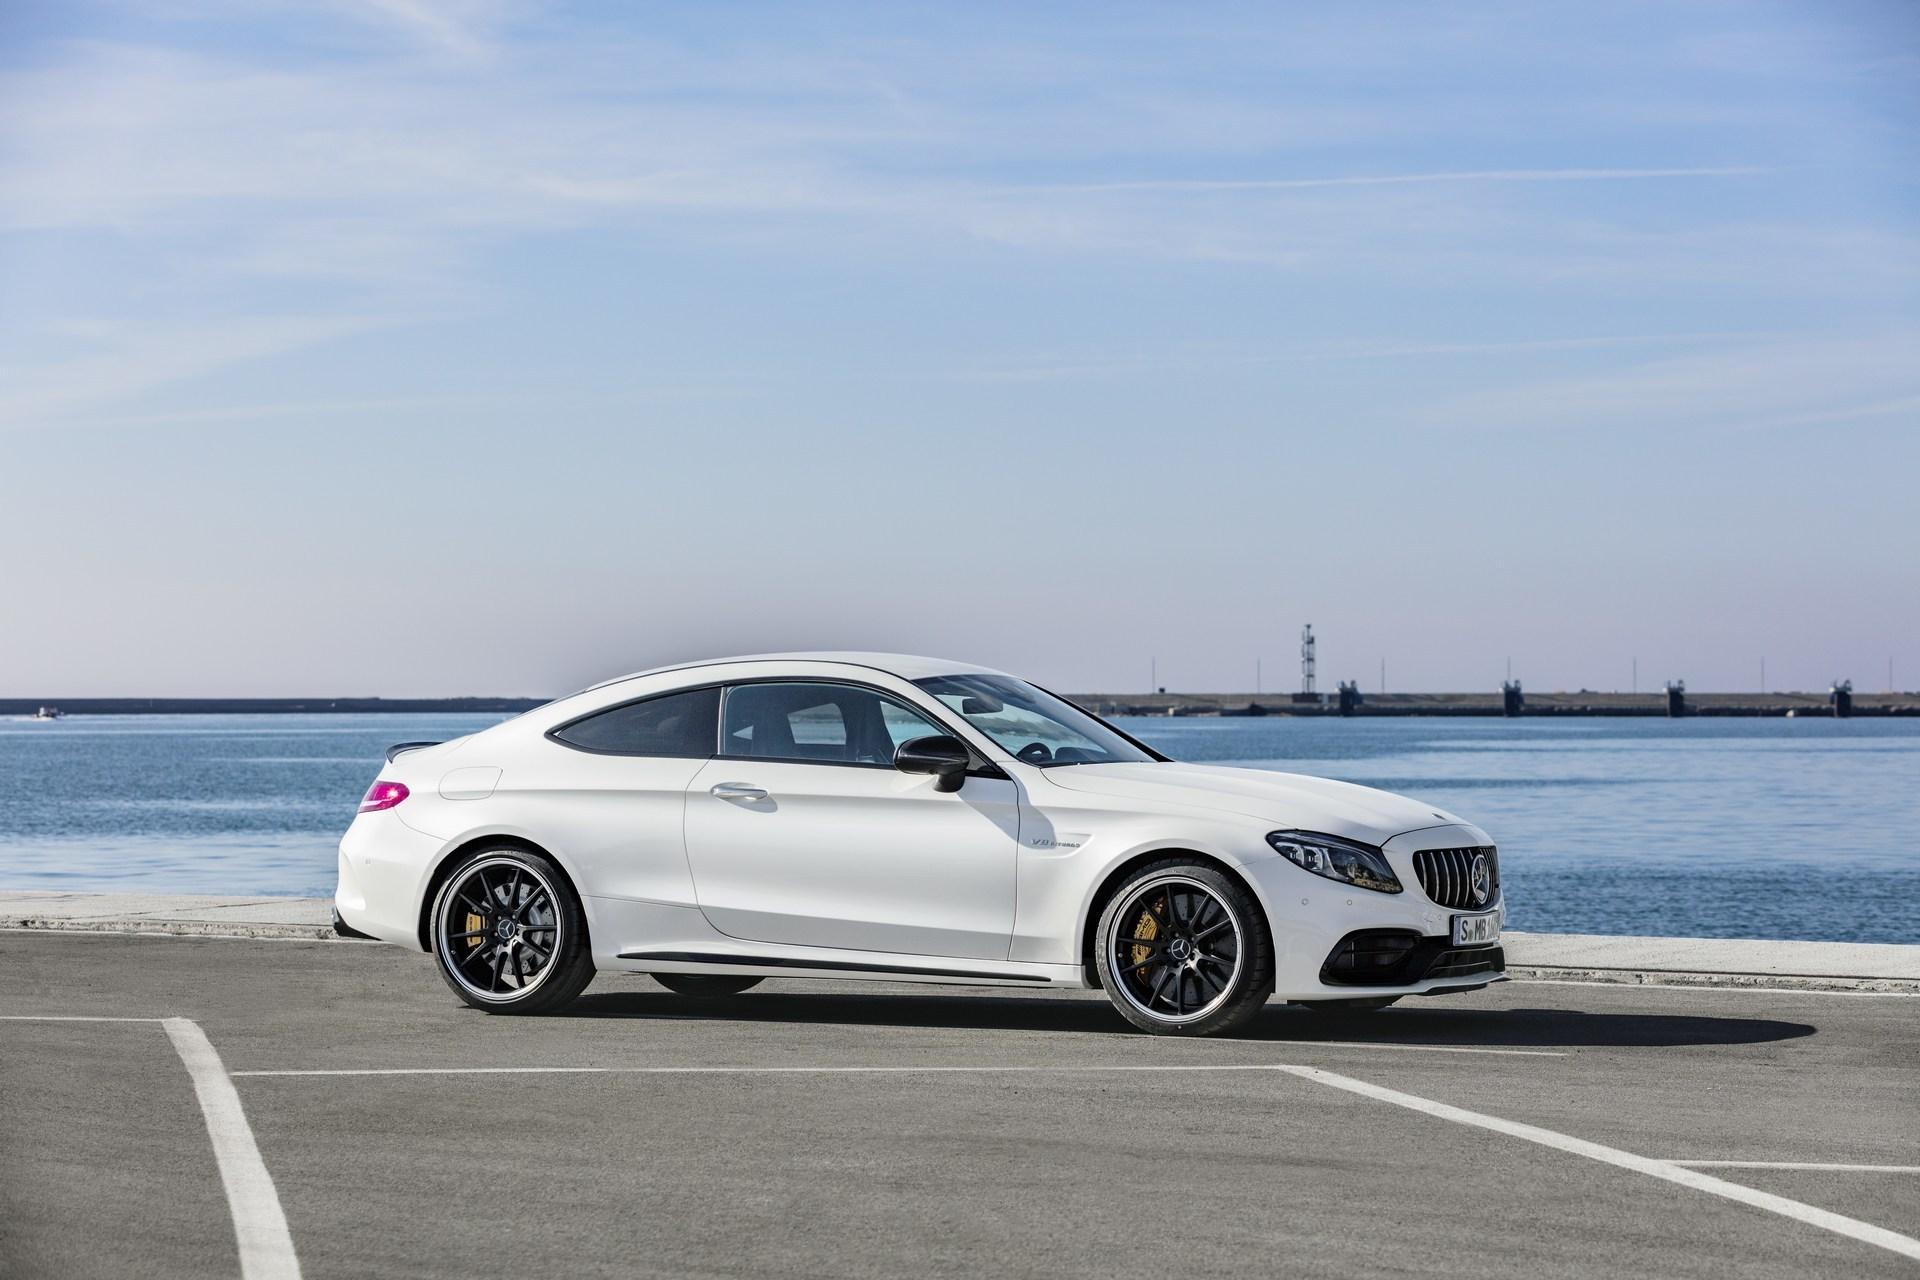 Mercedes-AMG-C63-Coupe-16.jpg